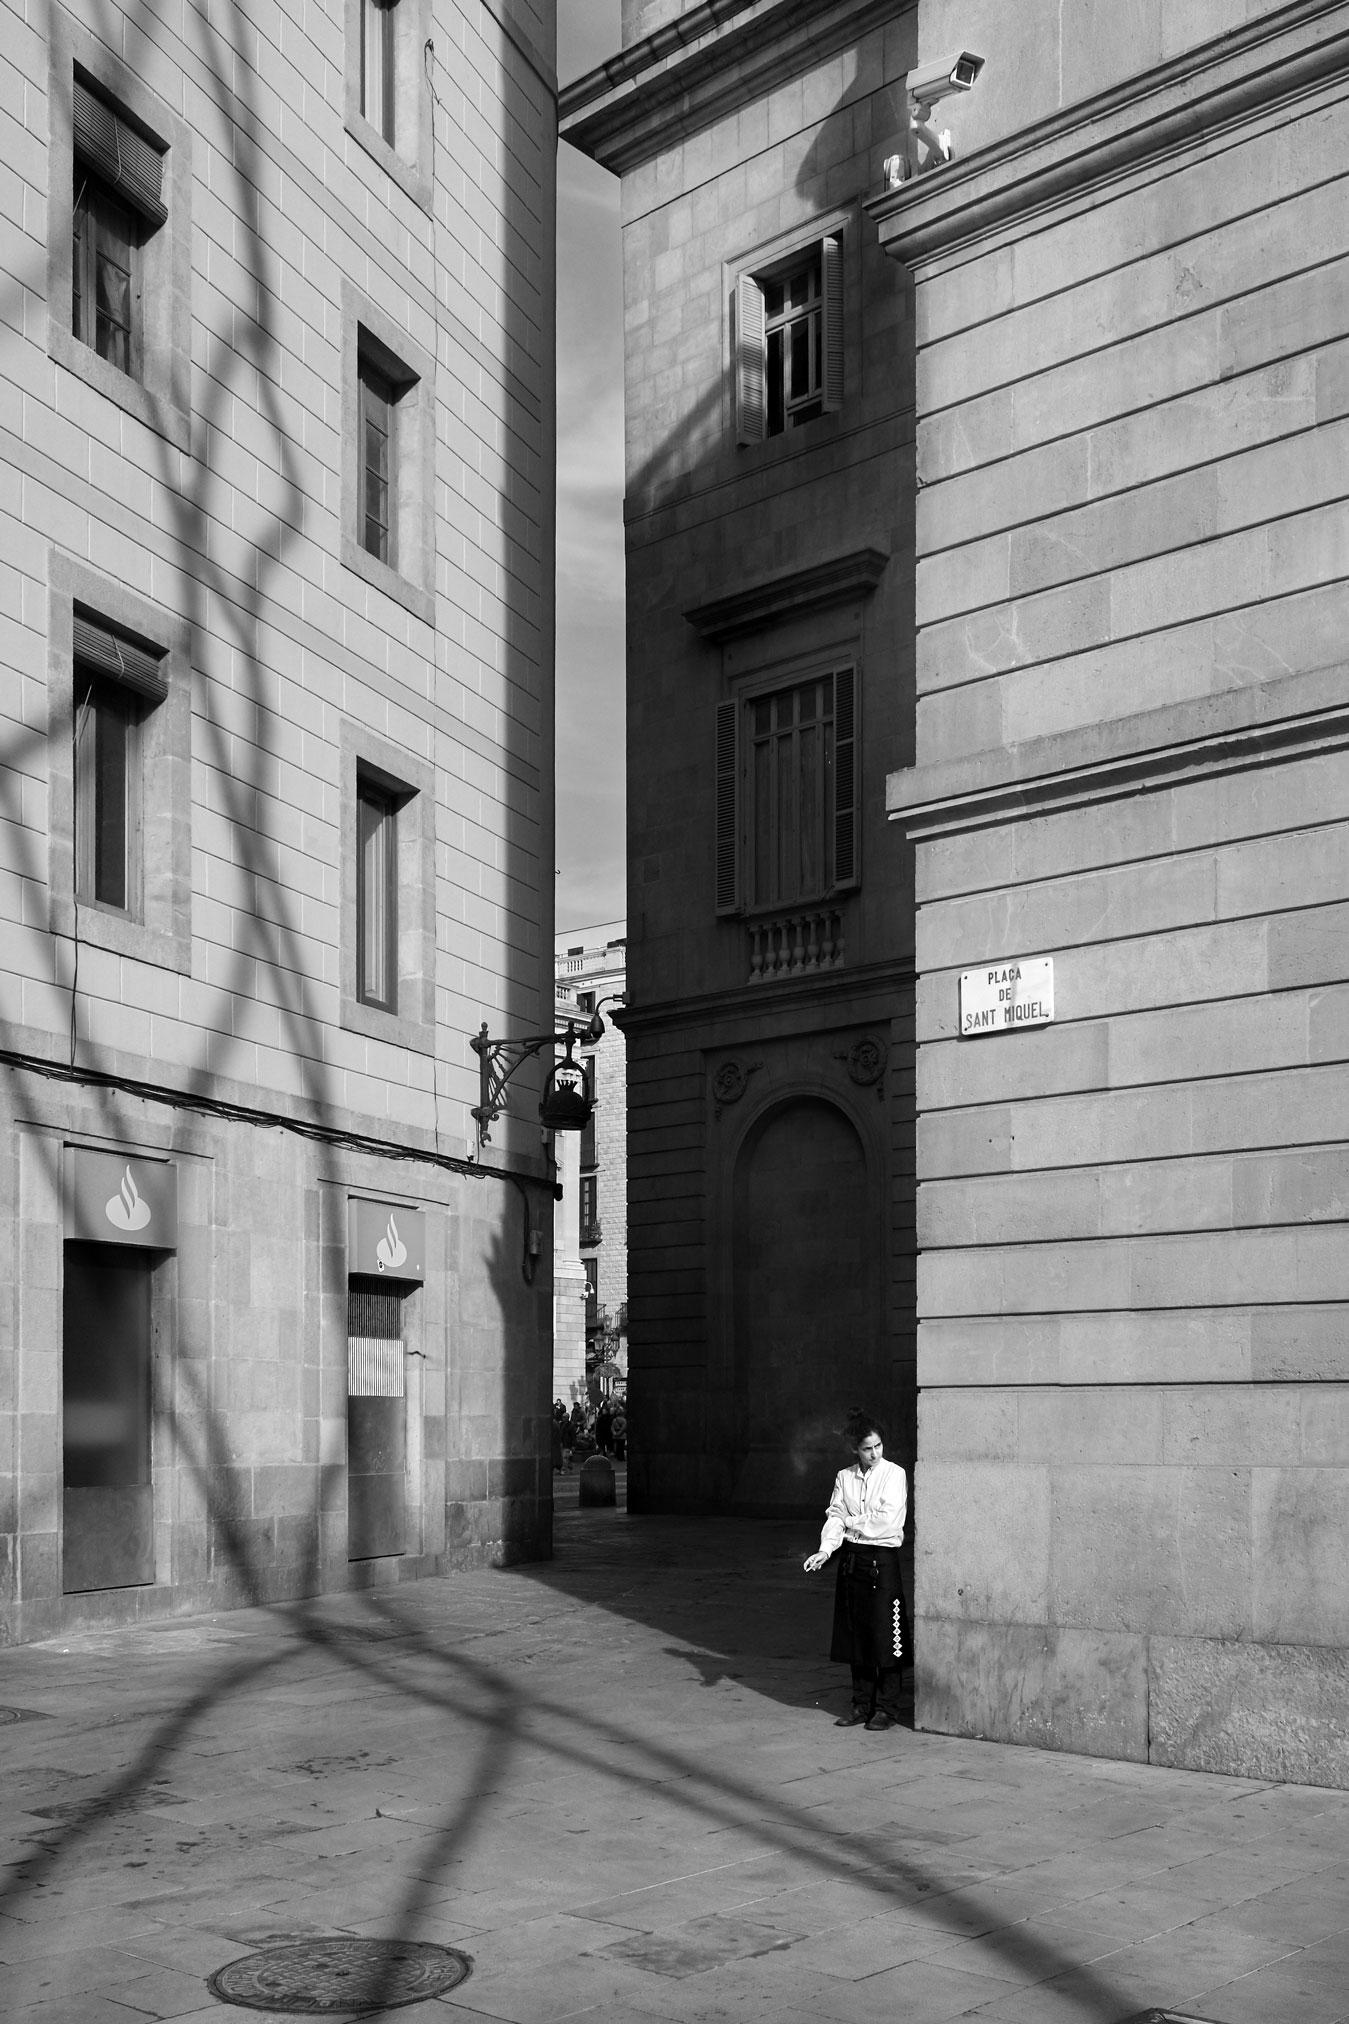 Barcelona,Spain 2014